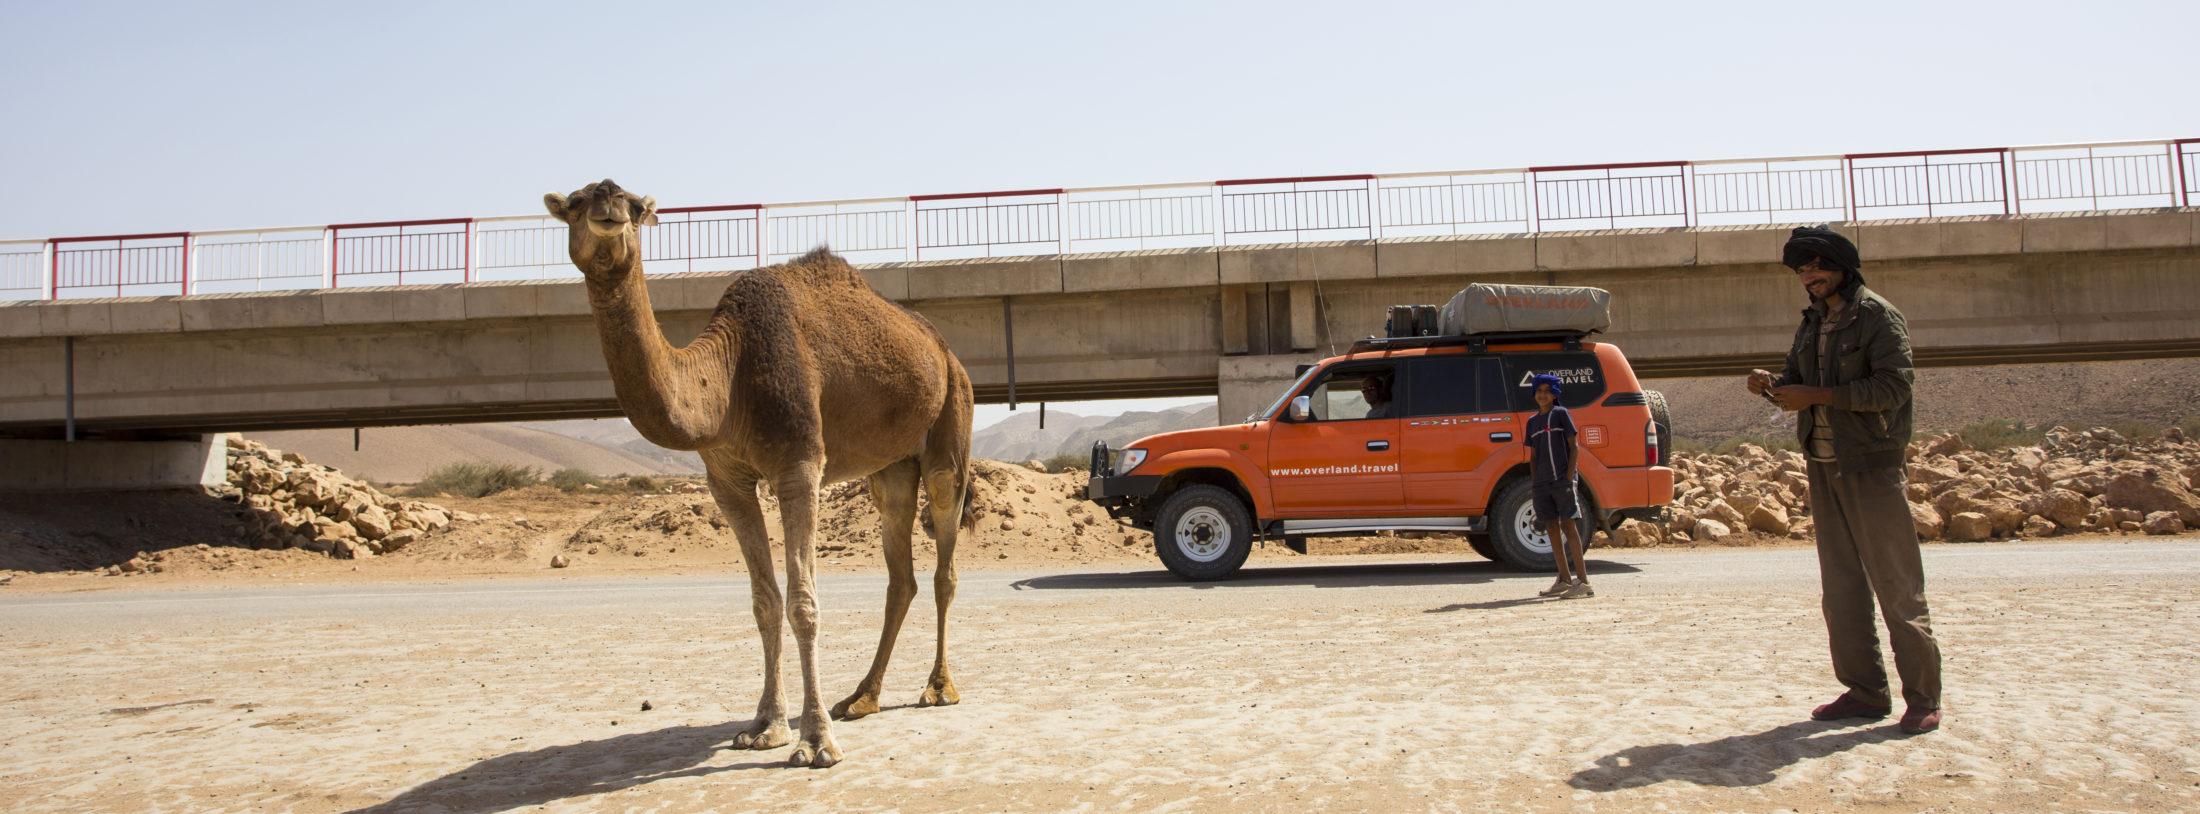 Marokko kameel